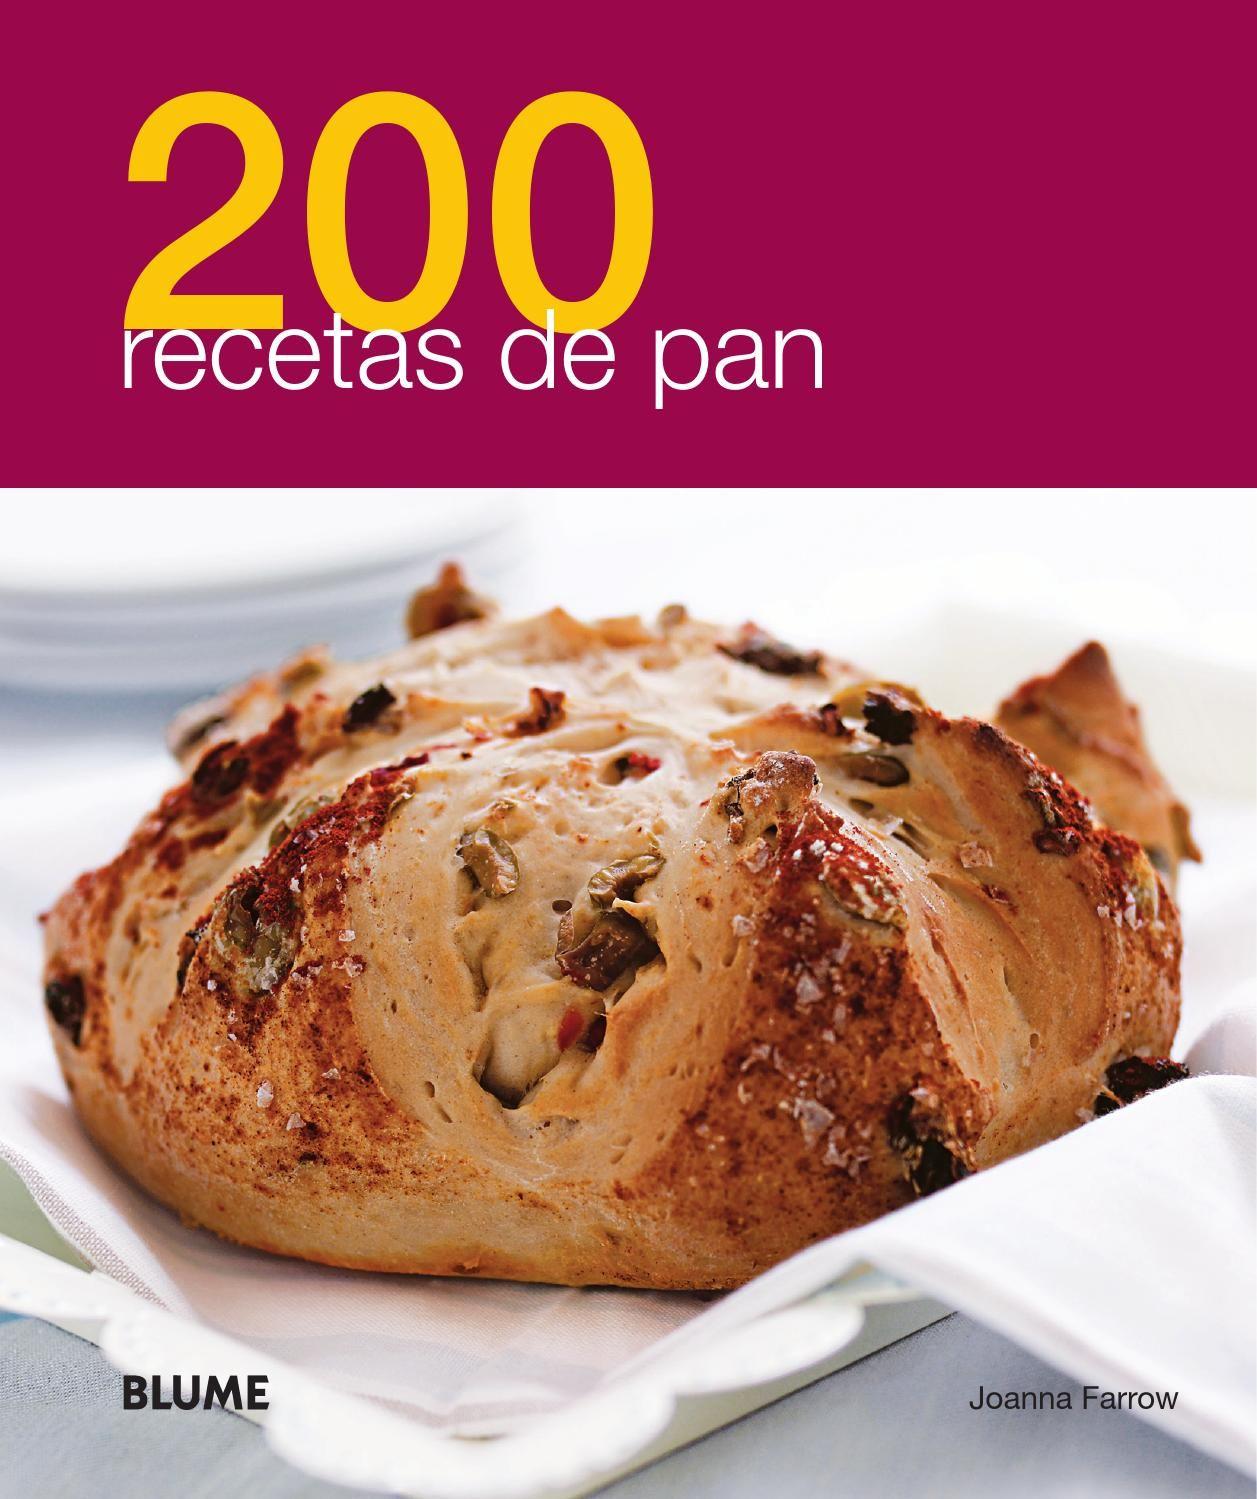 200 recetas pan | pan | Recetas, Recetas de pan y Pan ...